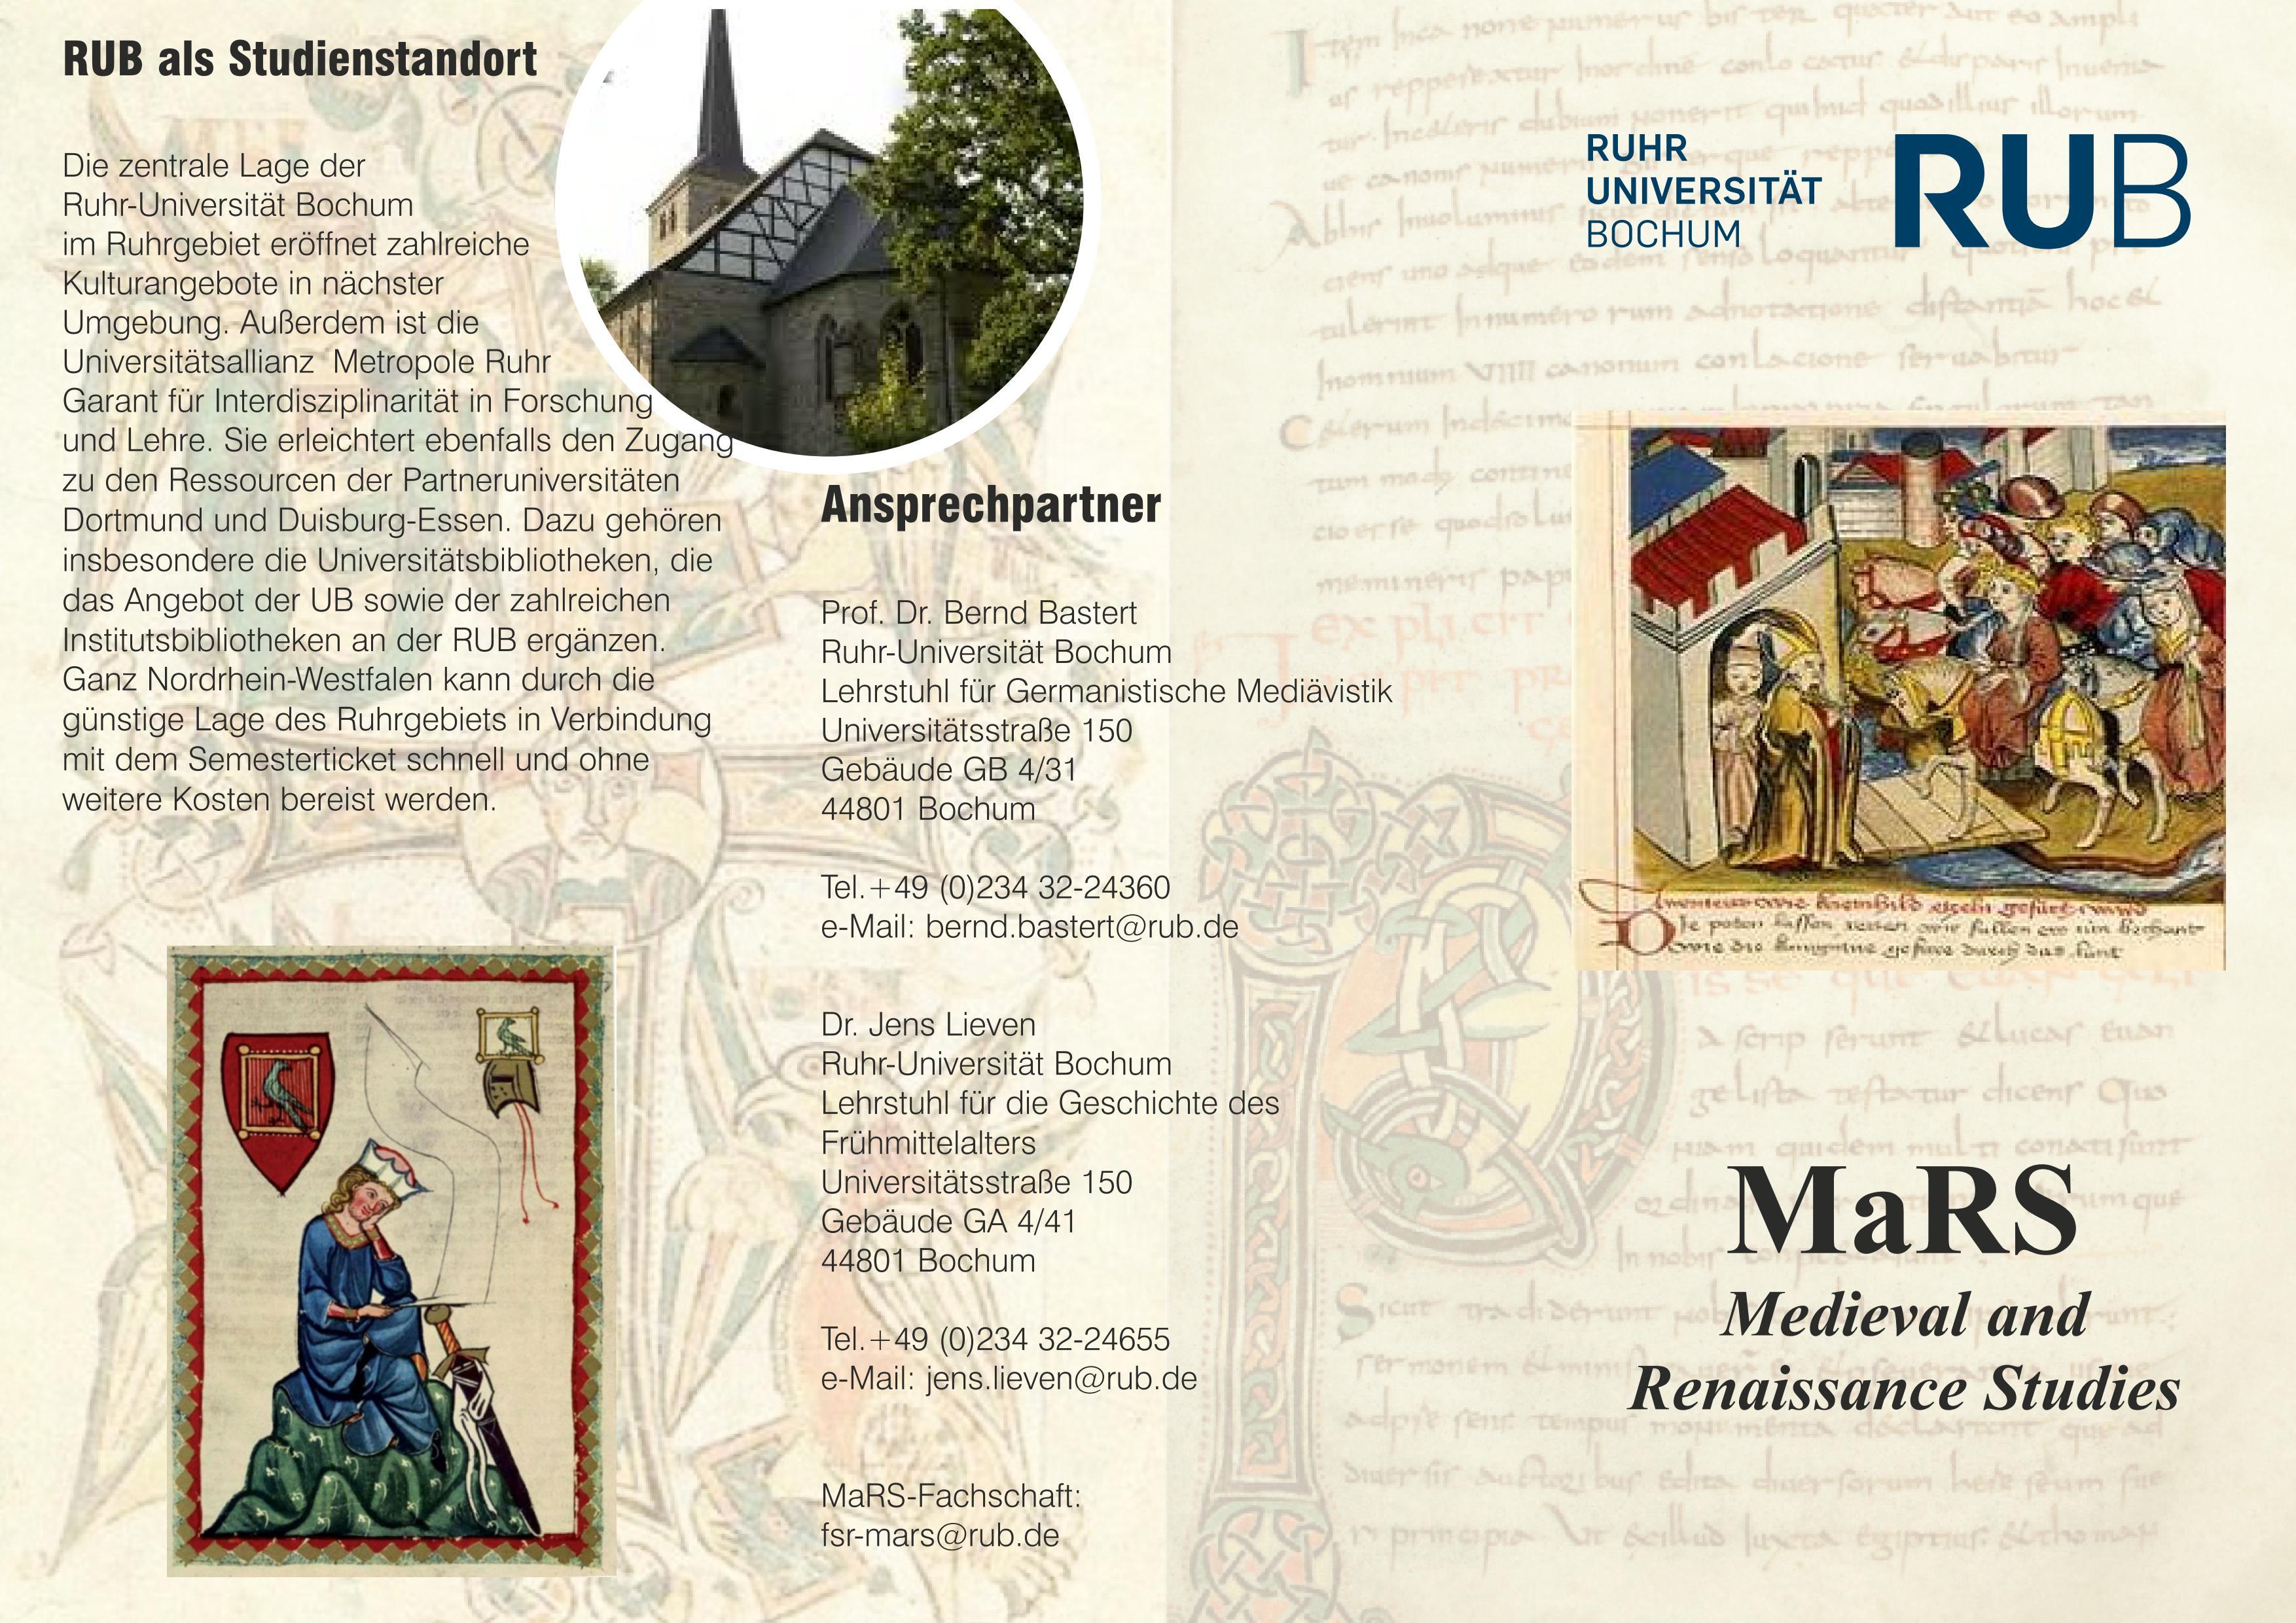 Stunning Gebrauchte Küchen Bochum Ideas - Ridgewayng.com ...